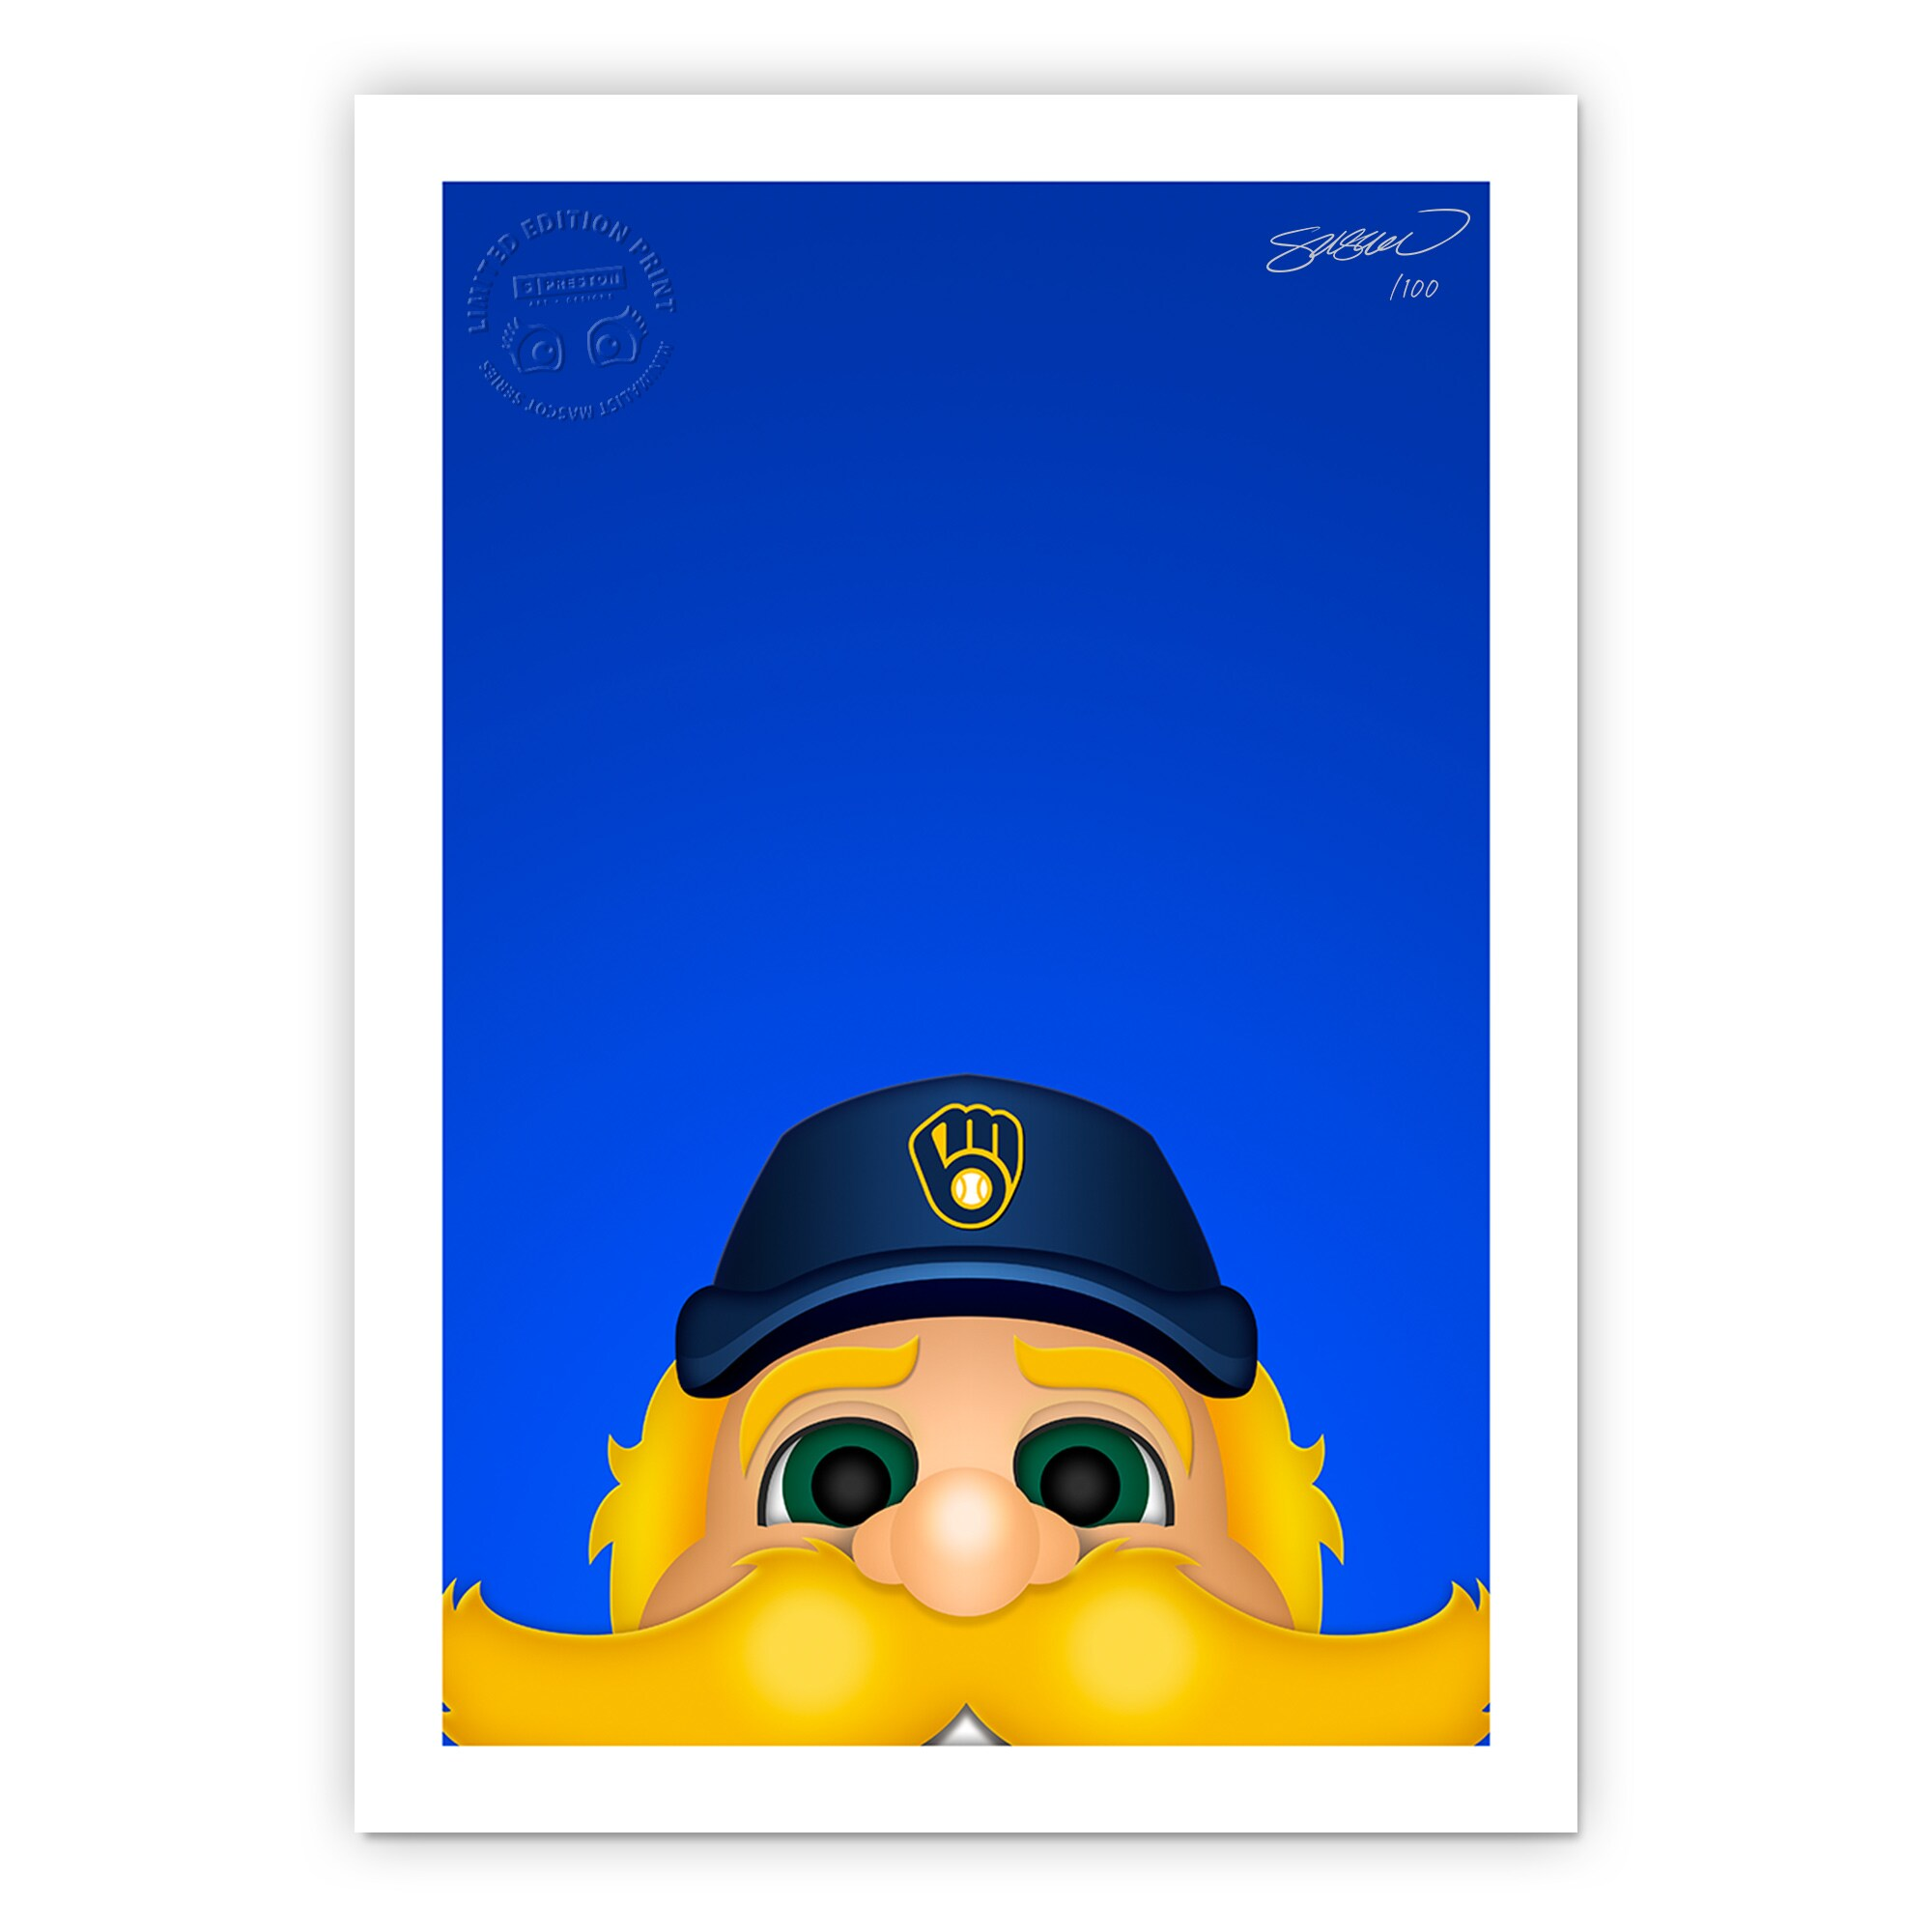 "Milwaukee Brewers 24"" x 32"" Minimalist Milwaukee Brewers Mascot Wall Art"